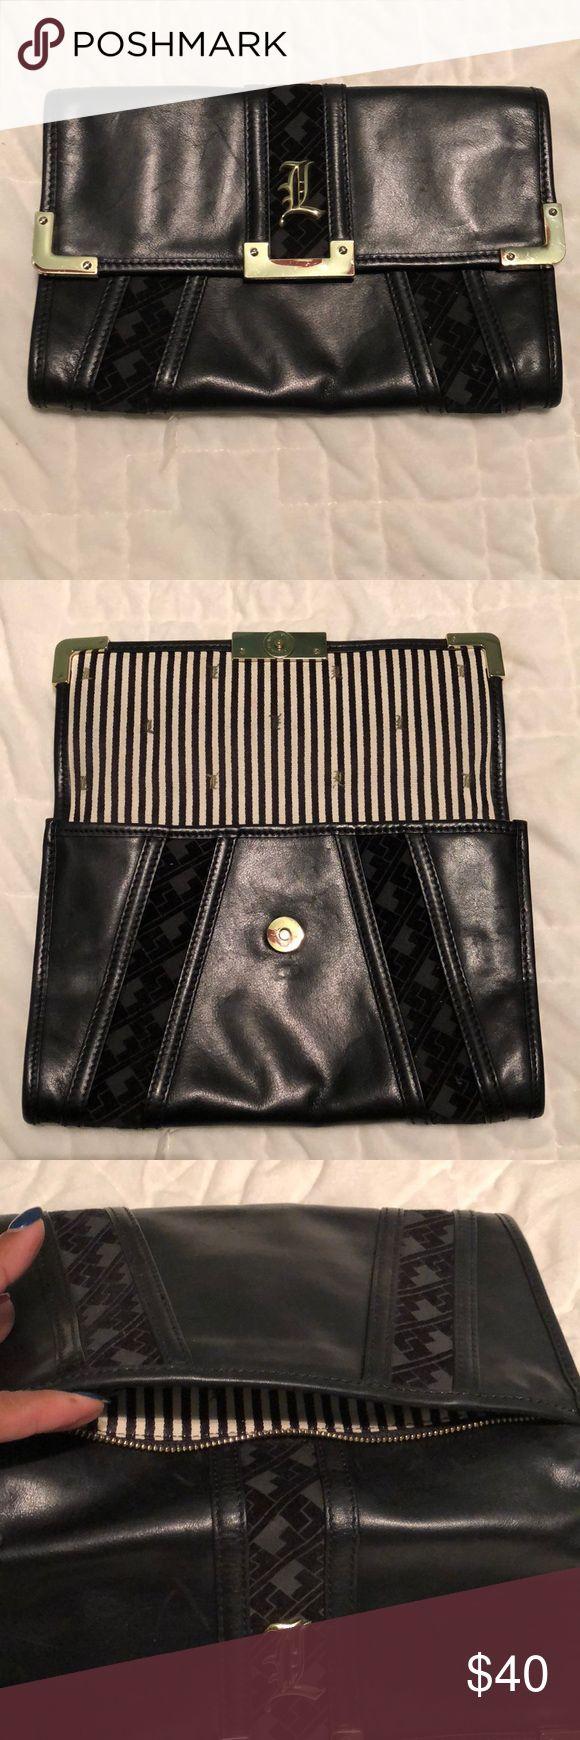 L.A.M.B. Gwen Stefani Black Leather Clutch L.A.M.B. Gwen Stefani Black Leather Clutch with black velour pattern. Perfect Friday night clutch! LAMB Bags Clutches & Wristlets